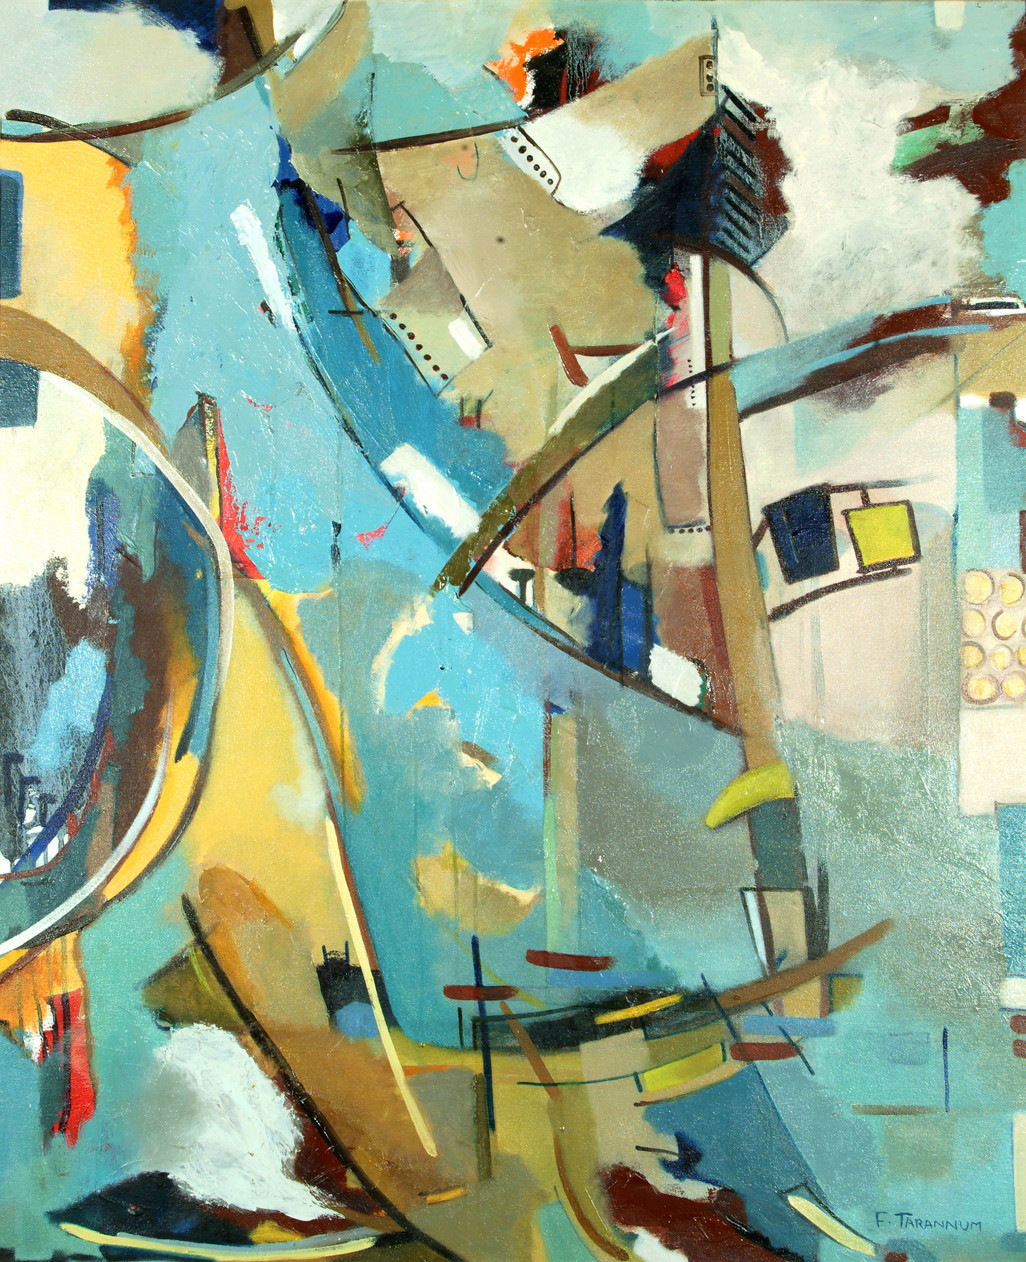 Flood Waters by F Tarannum, Illustration Painting, Oil on Canvas, Beige color